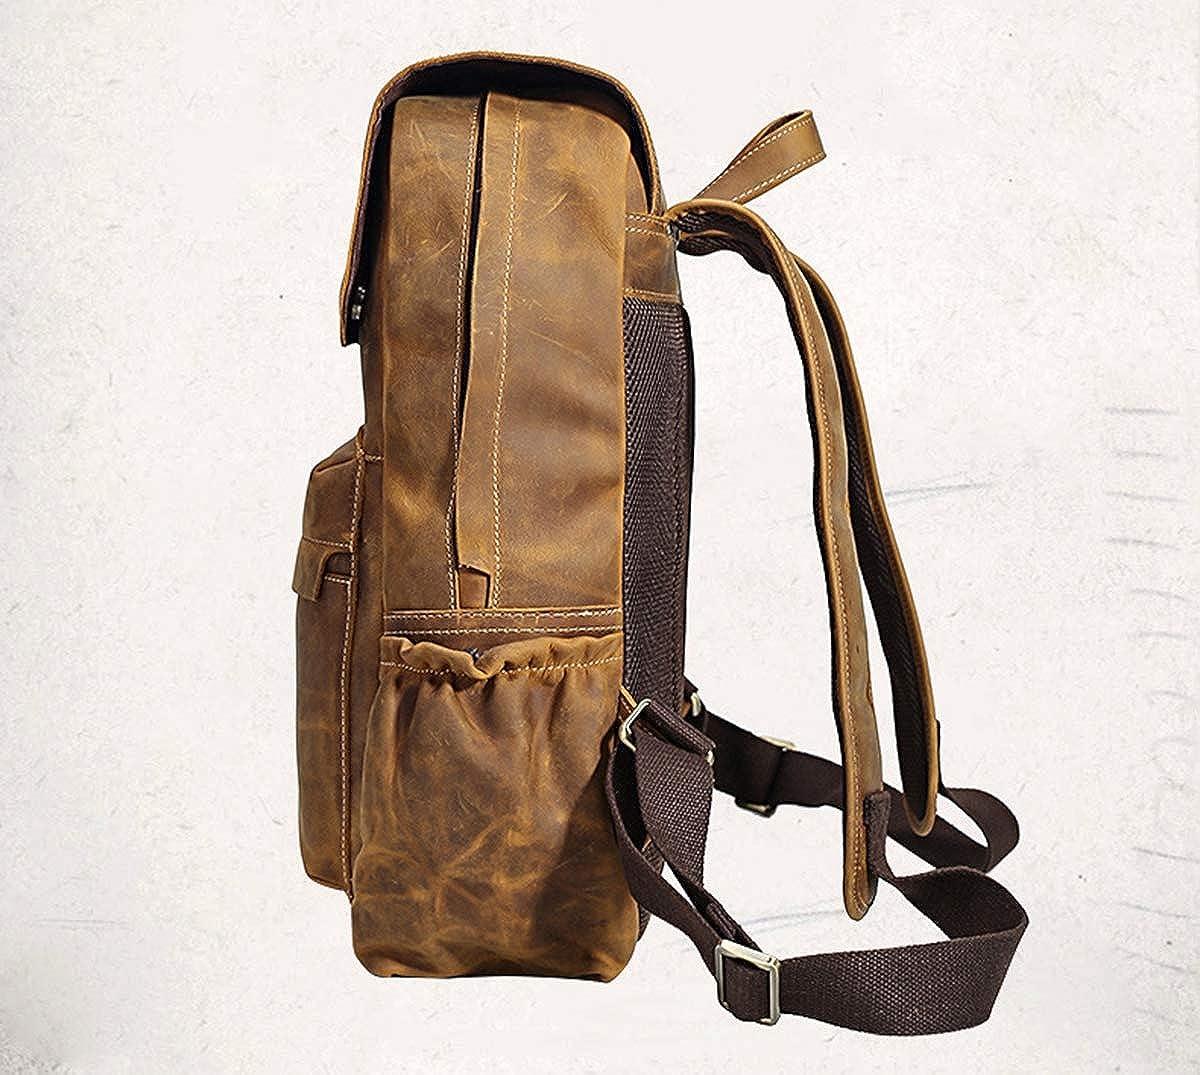 AHWZ DSLR Camera Bag Shoulder Messenger Bag Women Men Photography Crossbody Sling Bag Casual Rucksack Waterproof Anti-Theft Case